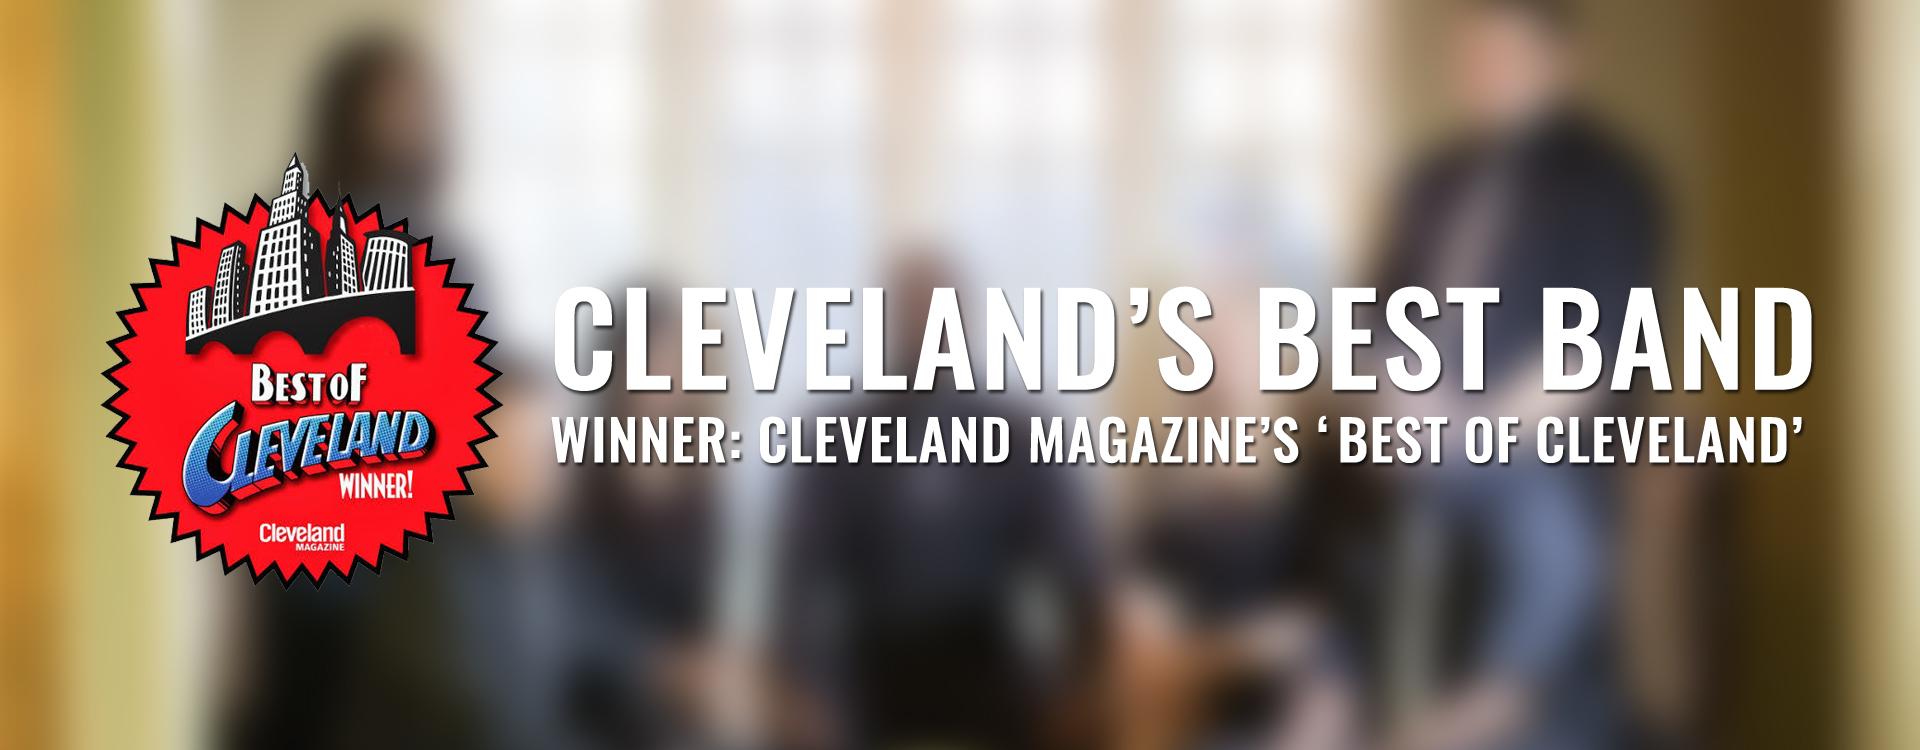 best-of-cleveland-clevelands-best-band